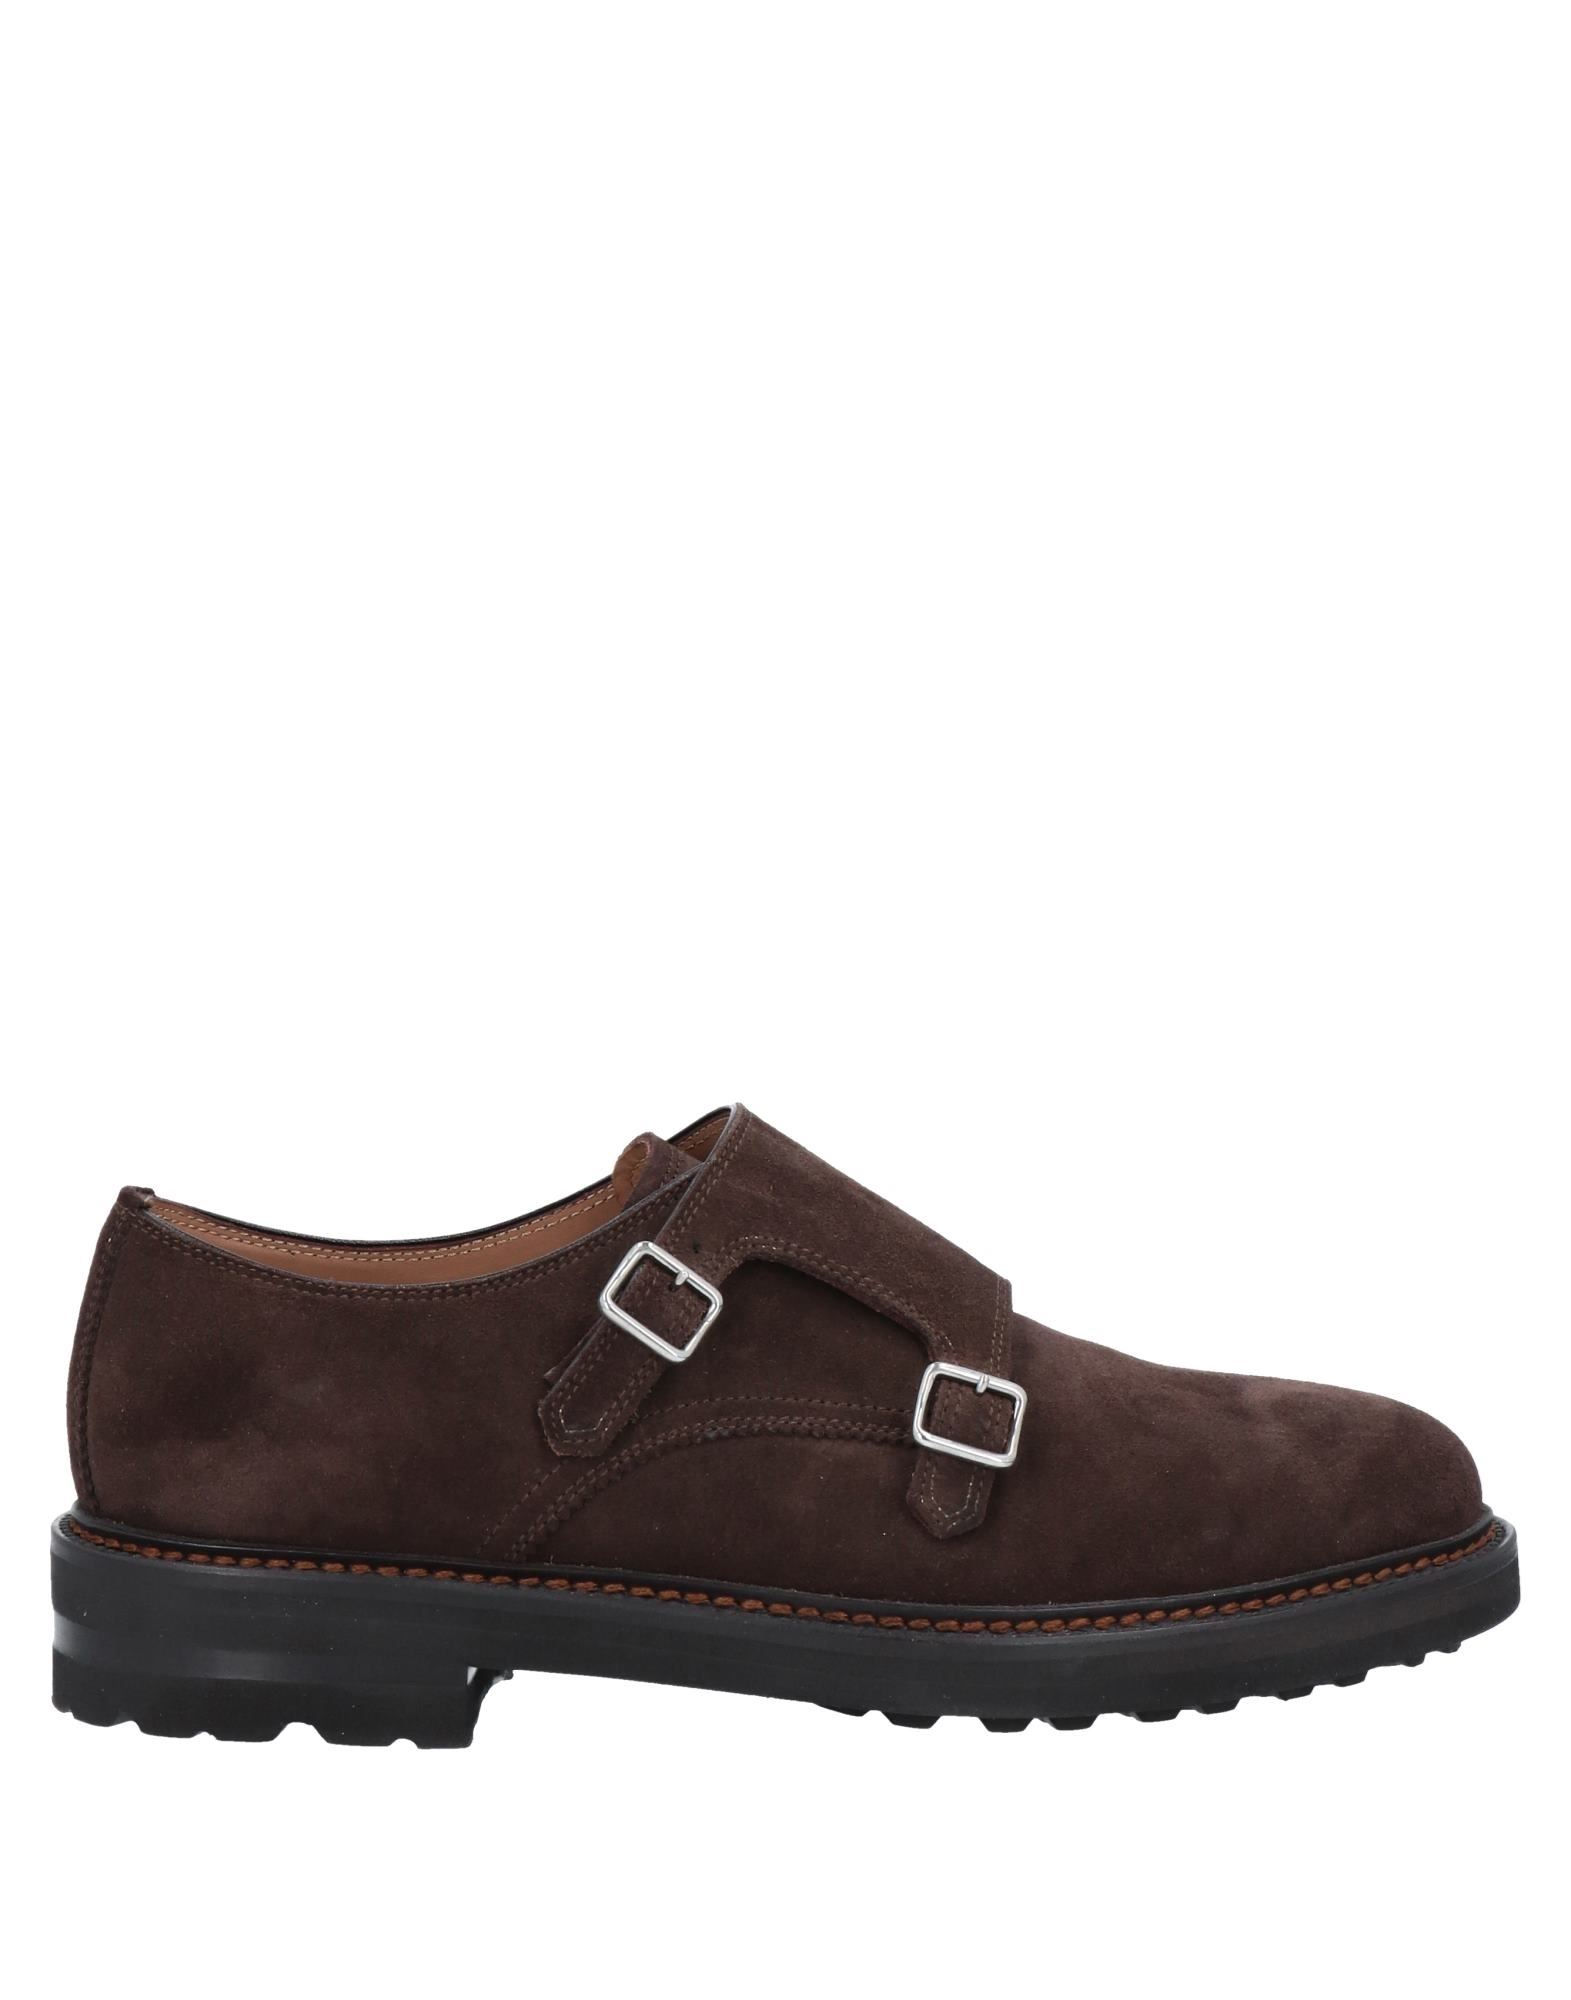 Henderson Baracco Loafers In Dark Brown